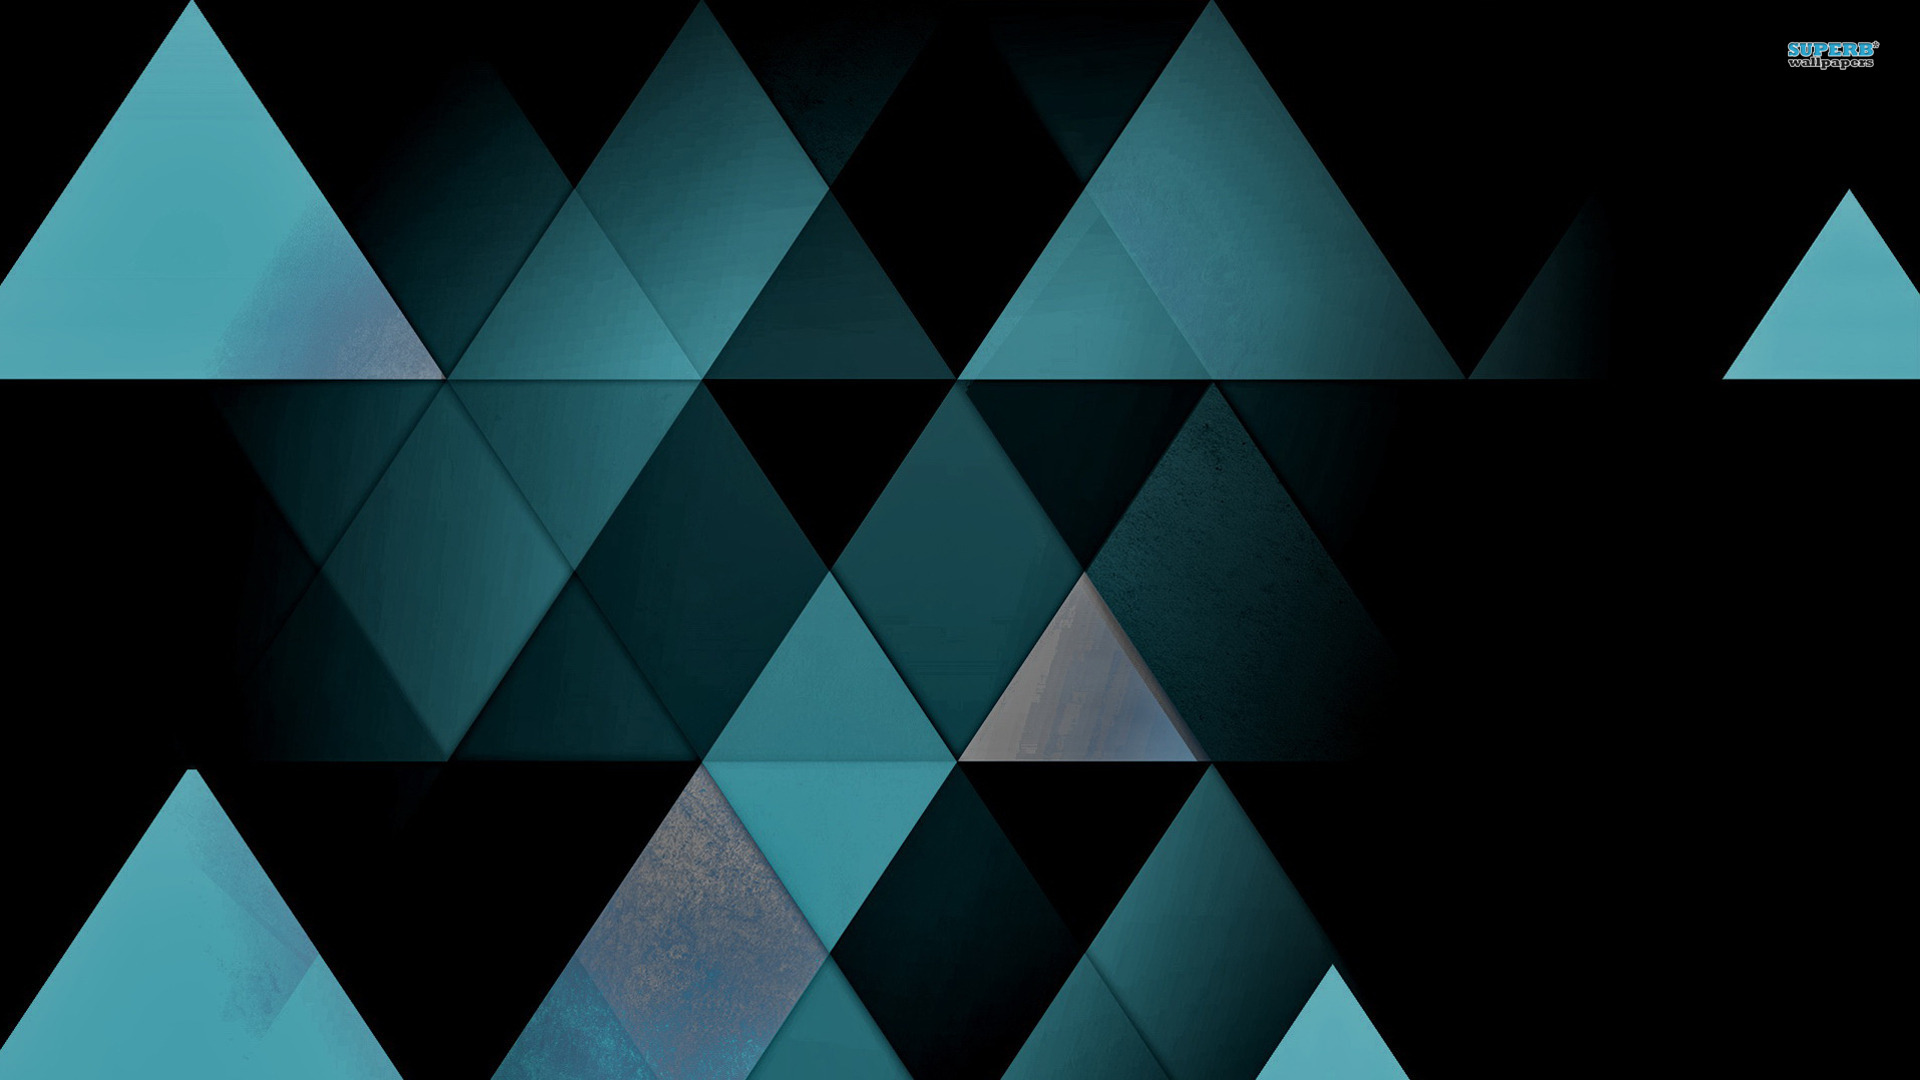 Mosaic triangles wallpaper 1920x1080 jpg